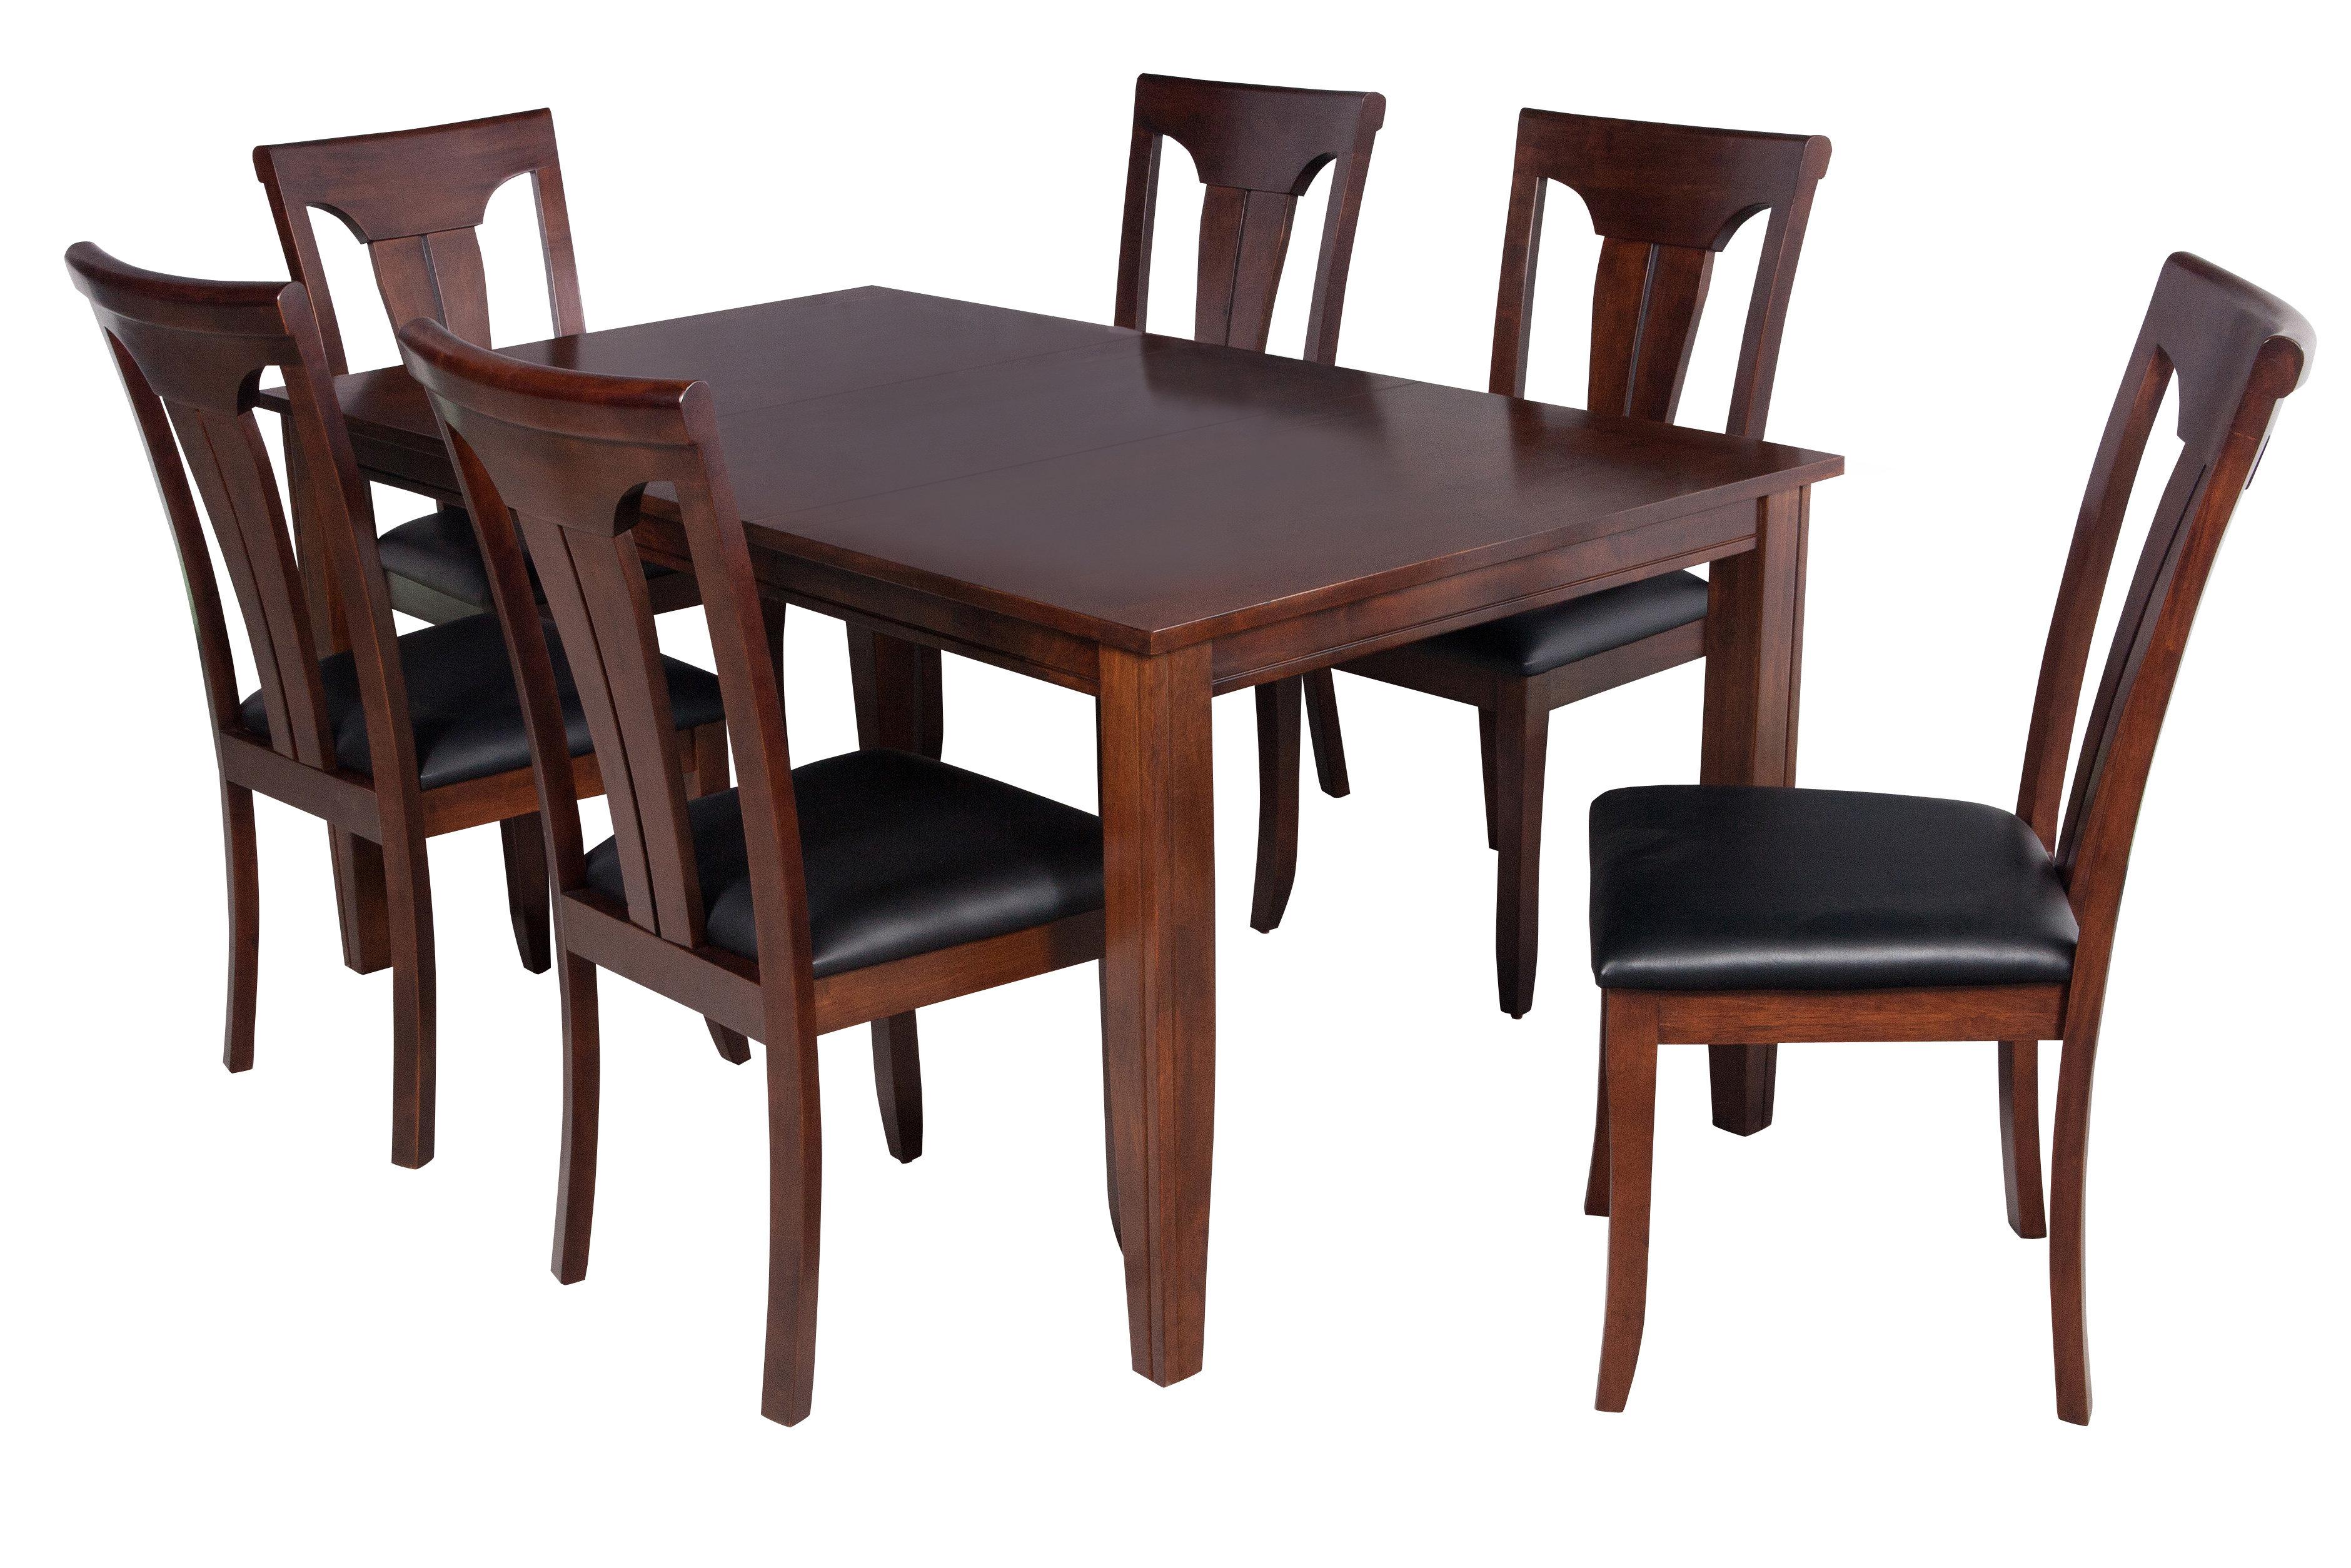 Wayfair Inside 2019 Adan 5 Piece Solid Wood Dining Sets (Set Of 5) (View 25 of 25)